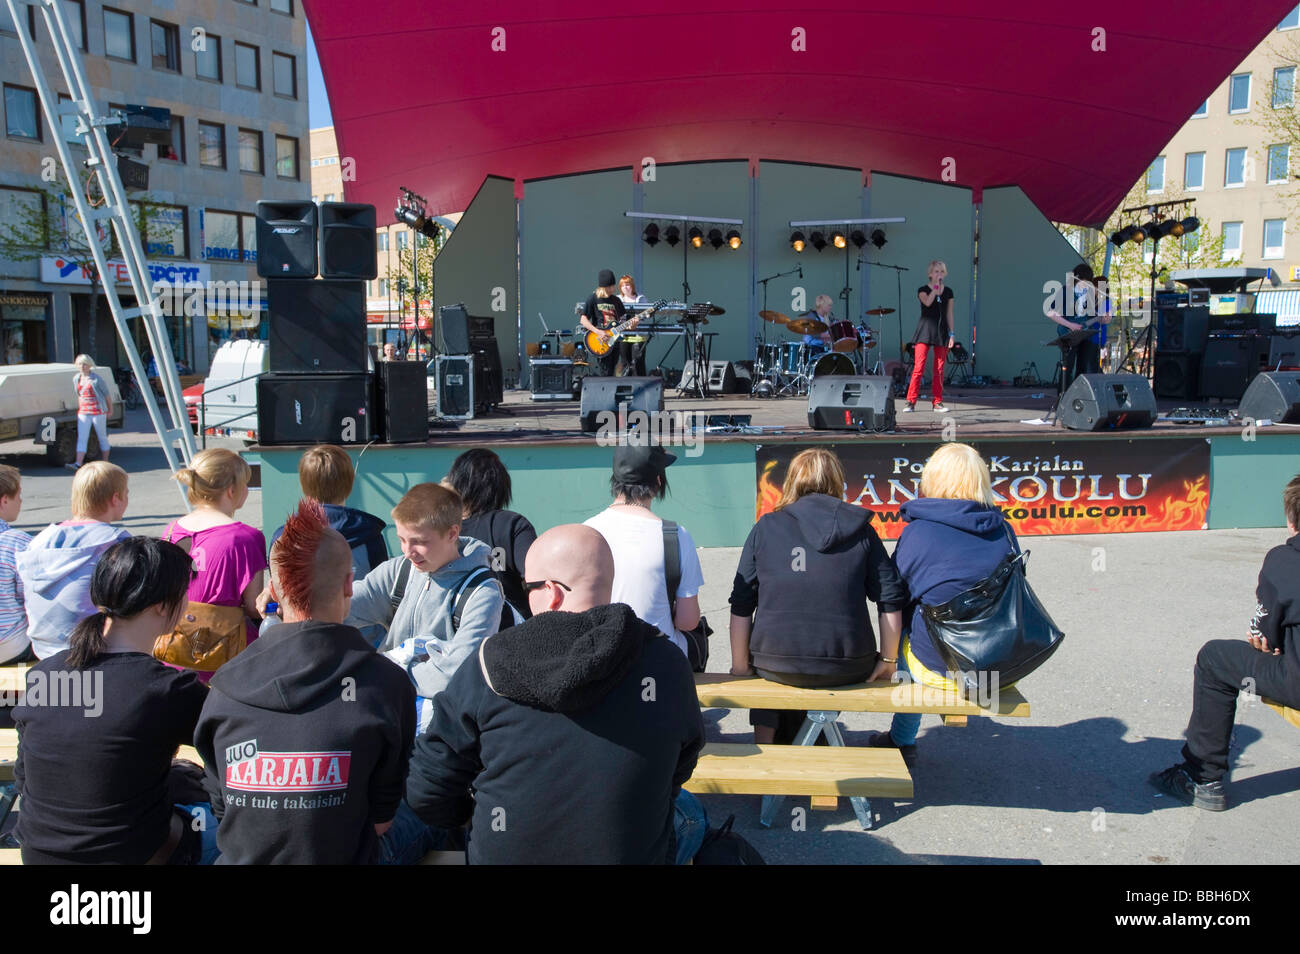 Teenage rock band performing on stage on Main Square Joensuu Karelia Finland - Stock Image